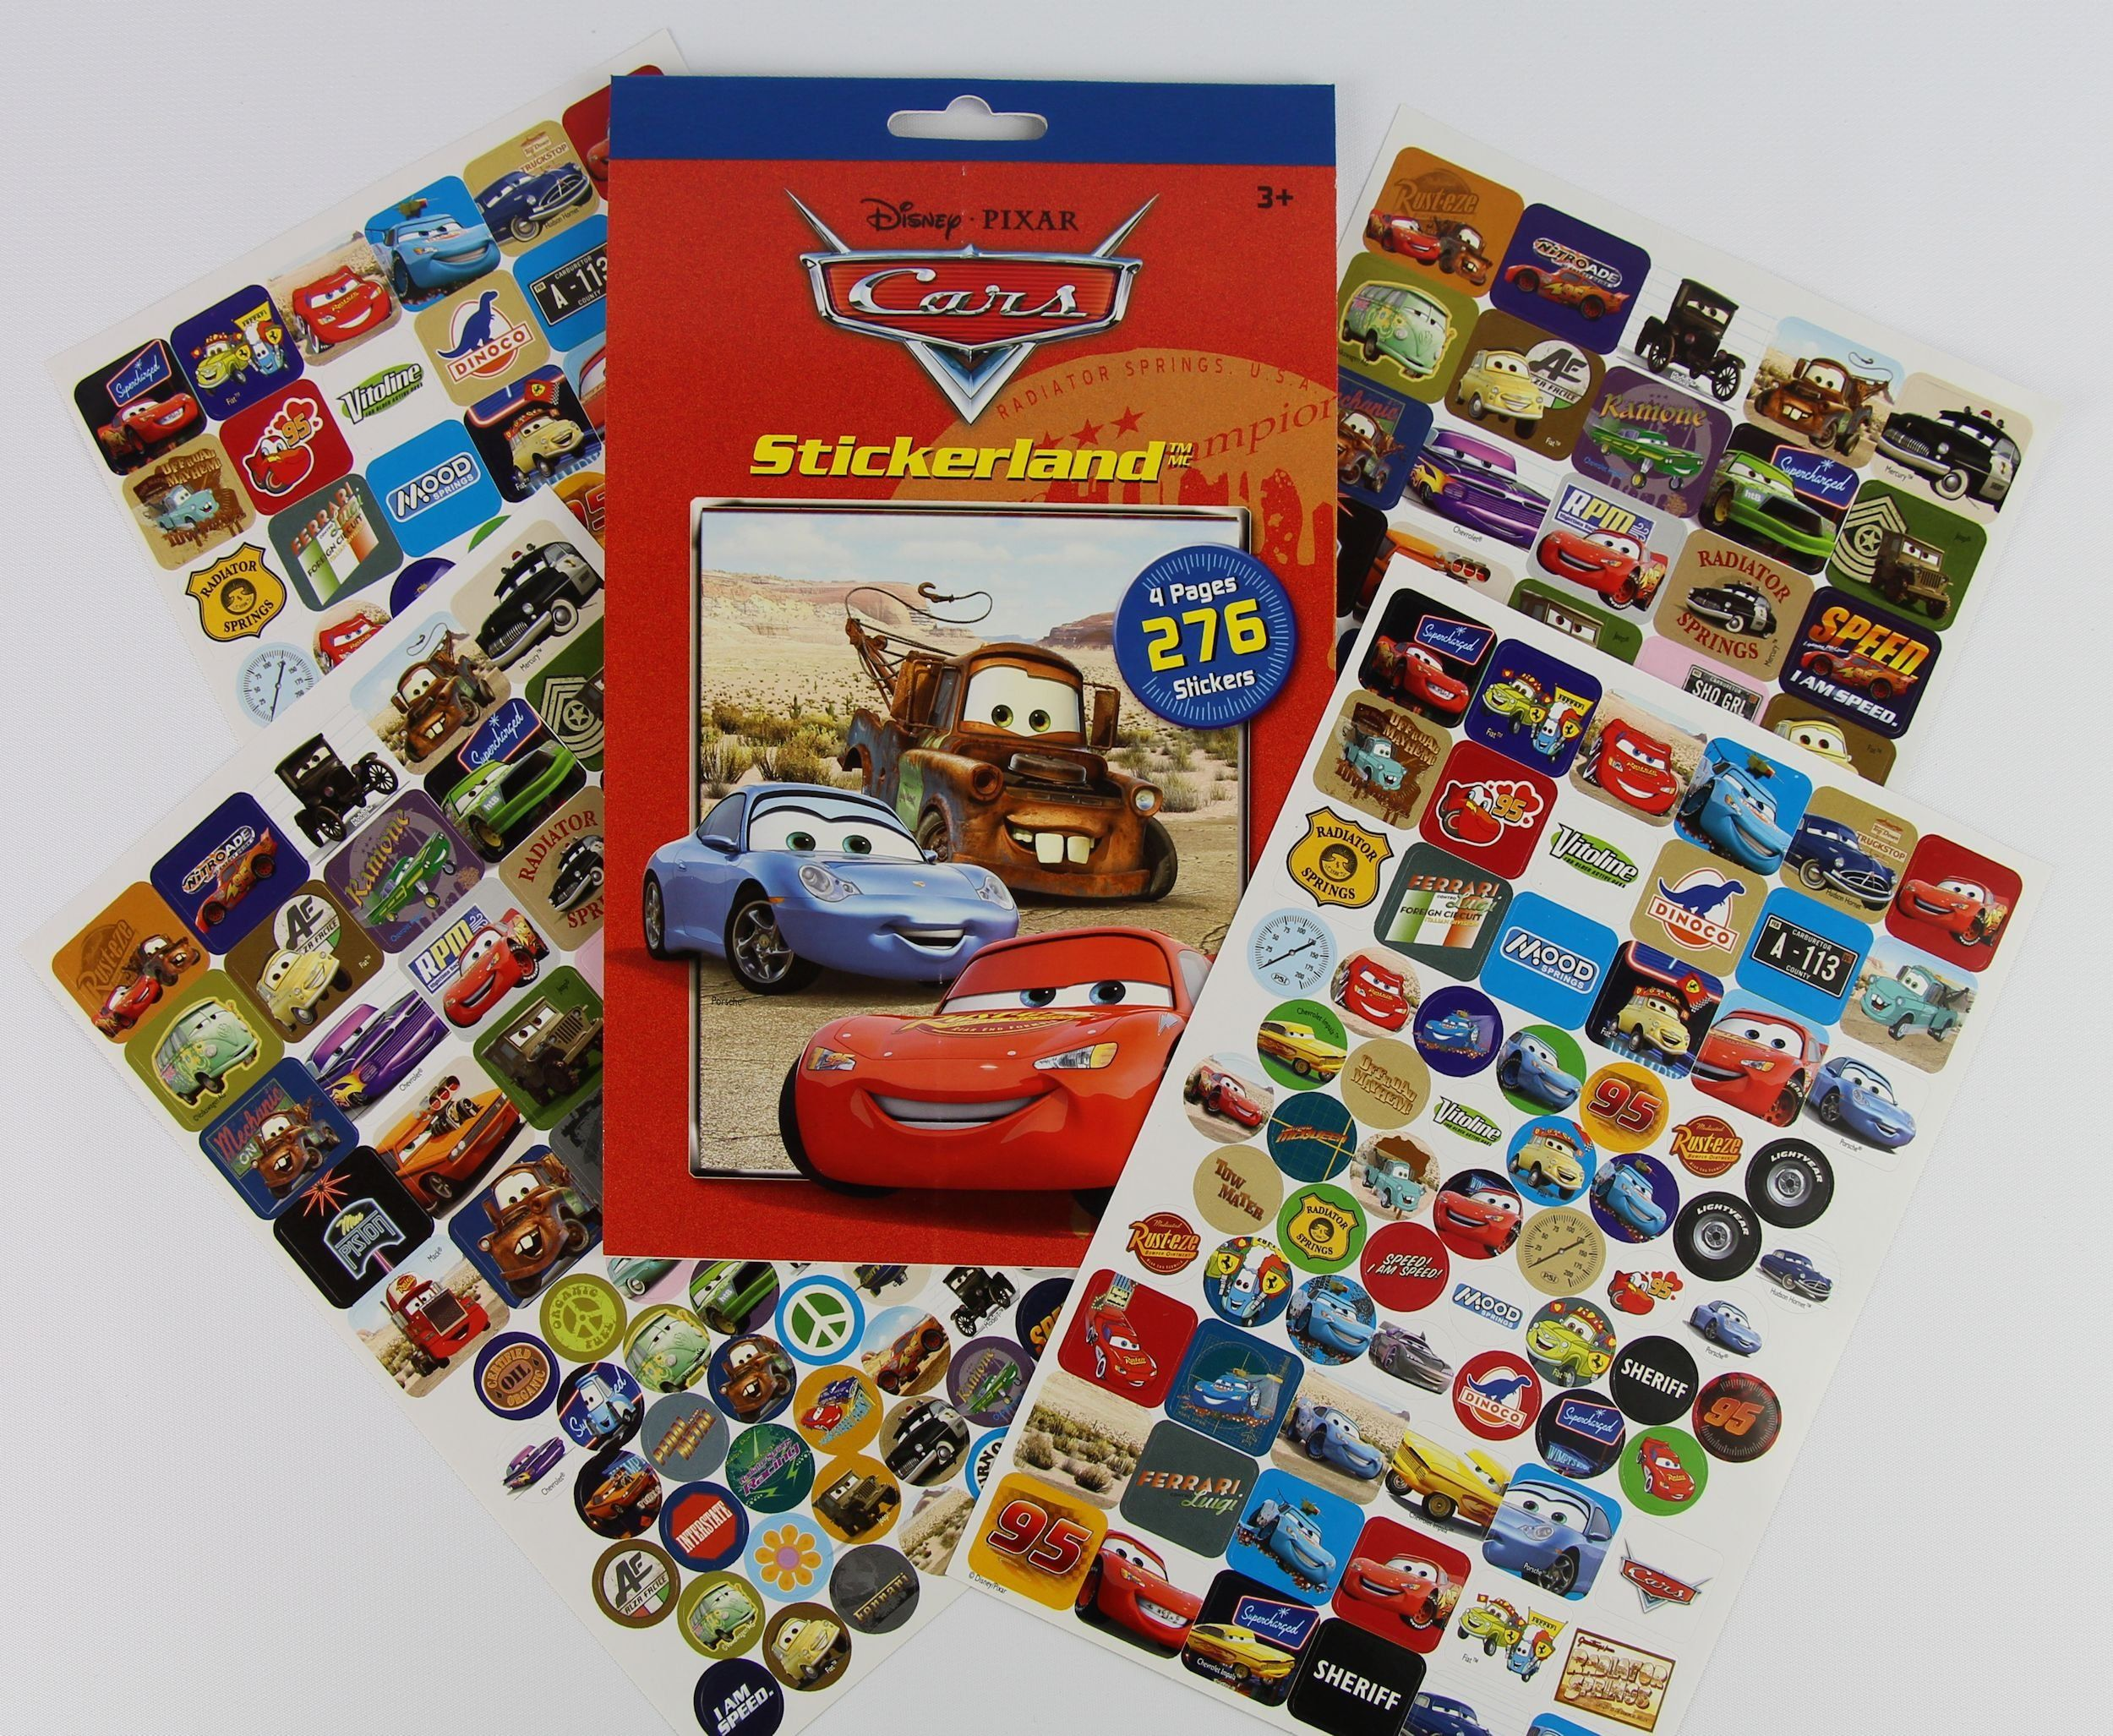 100 New Disney Pixar Cars Lightning Mcqueen Children Kids Bag of Stickers Reward